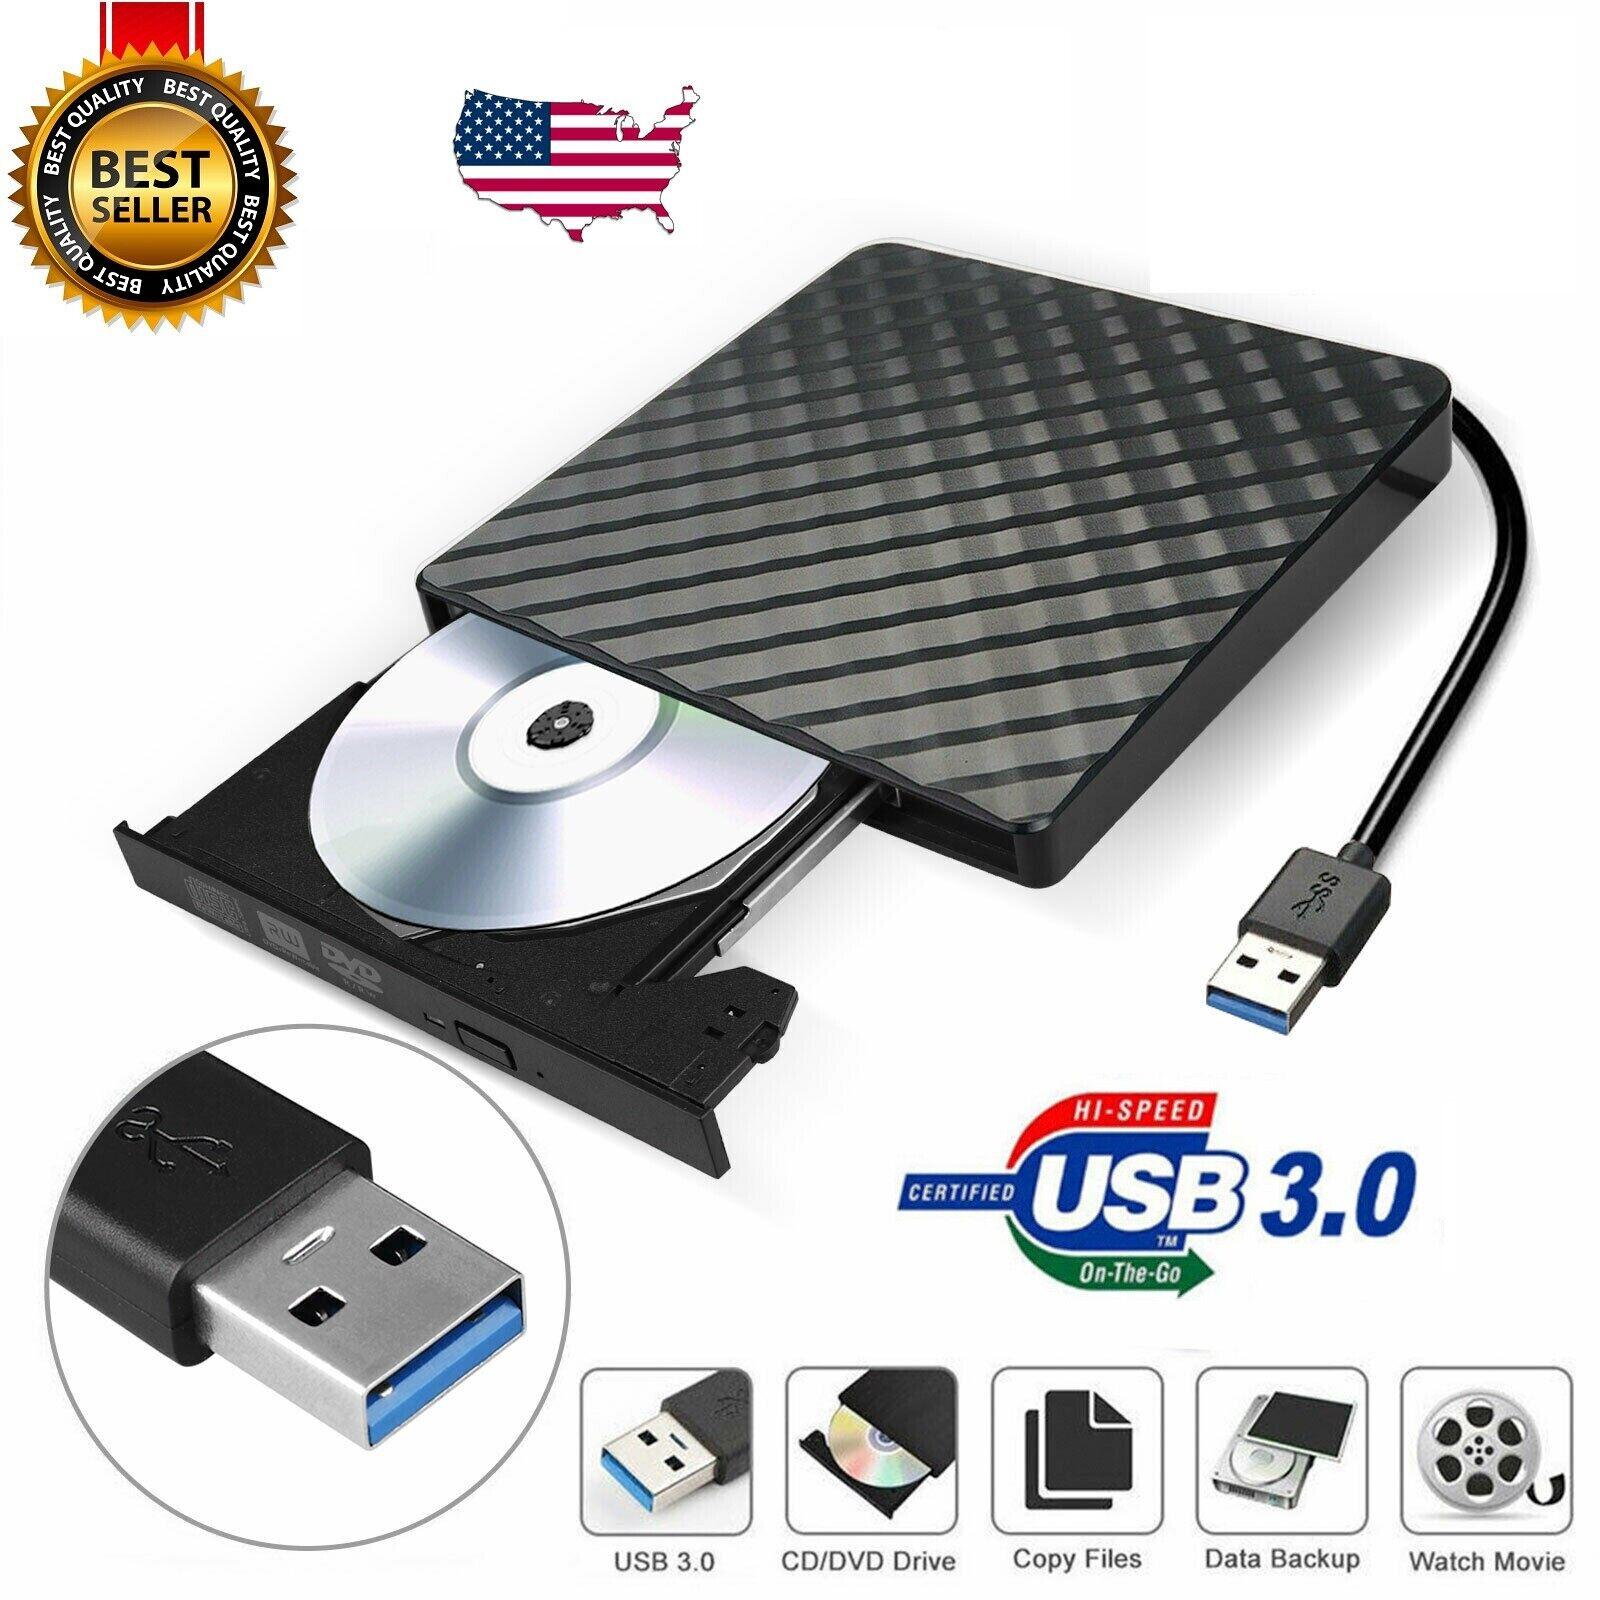 Slim External 8X USB 3.0 DVD RW CD Writer Drive Burner Reade